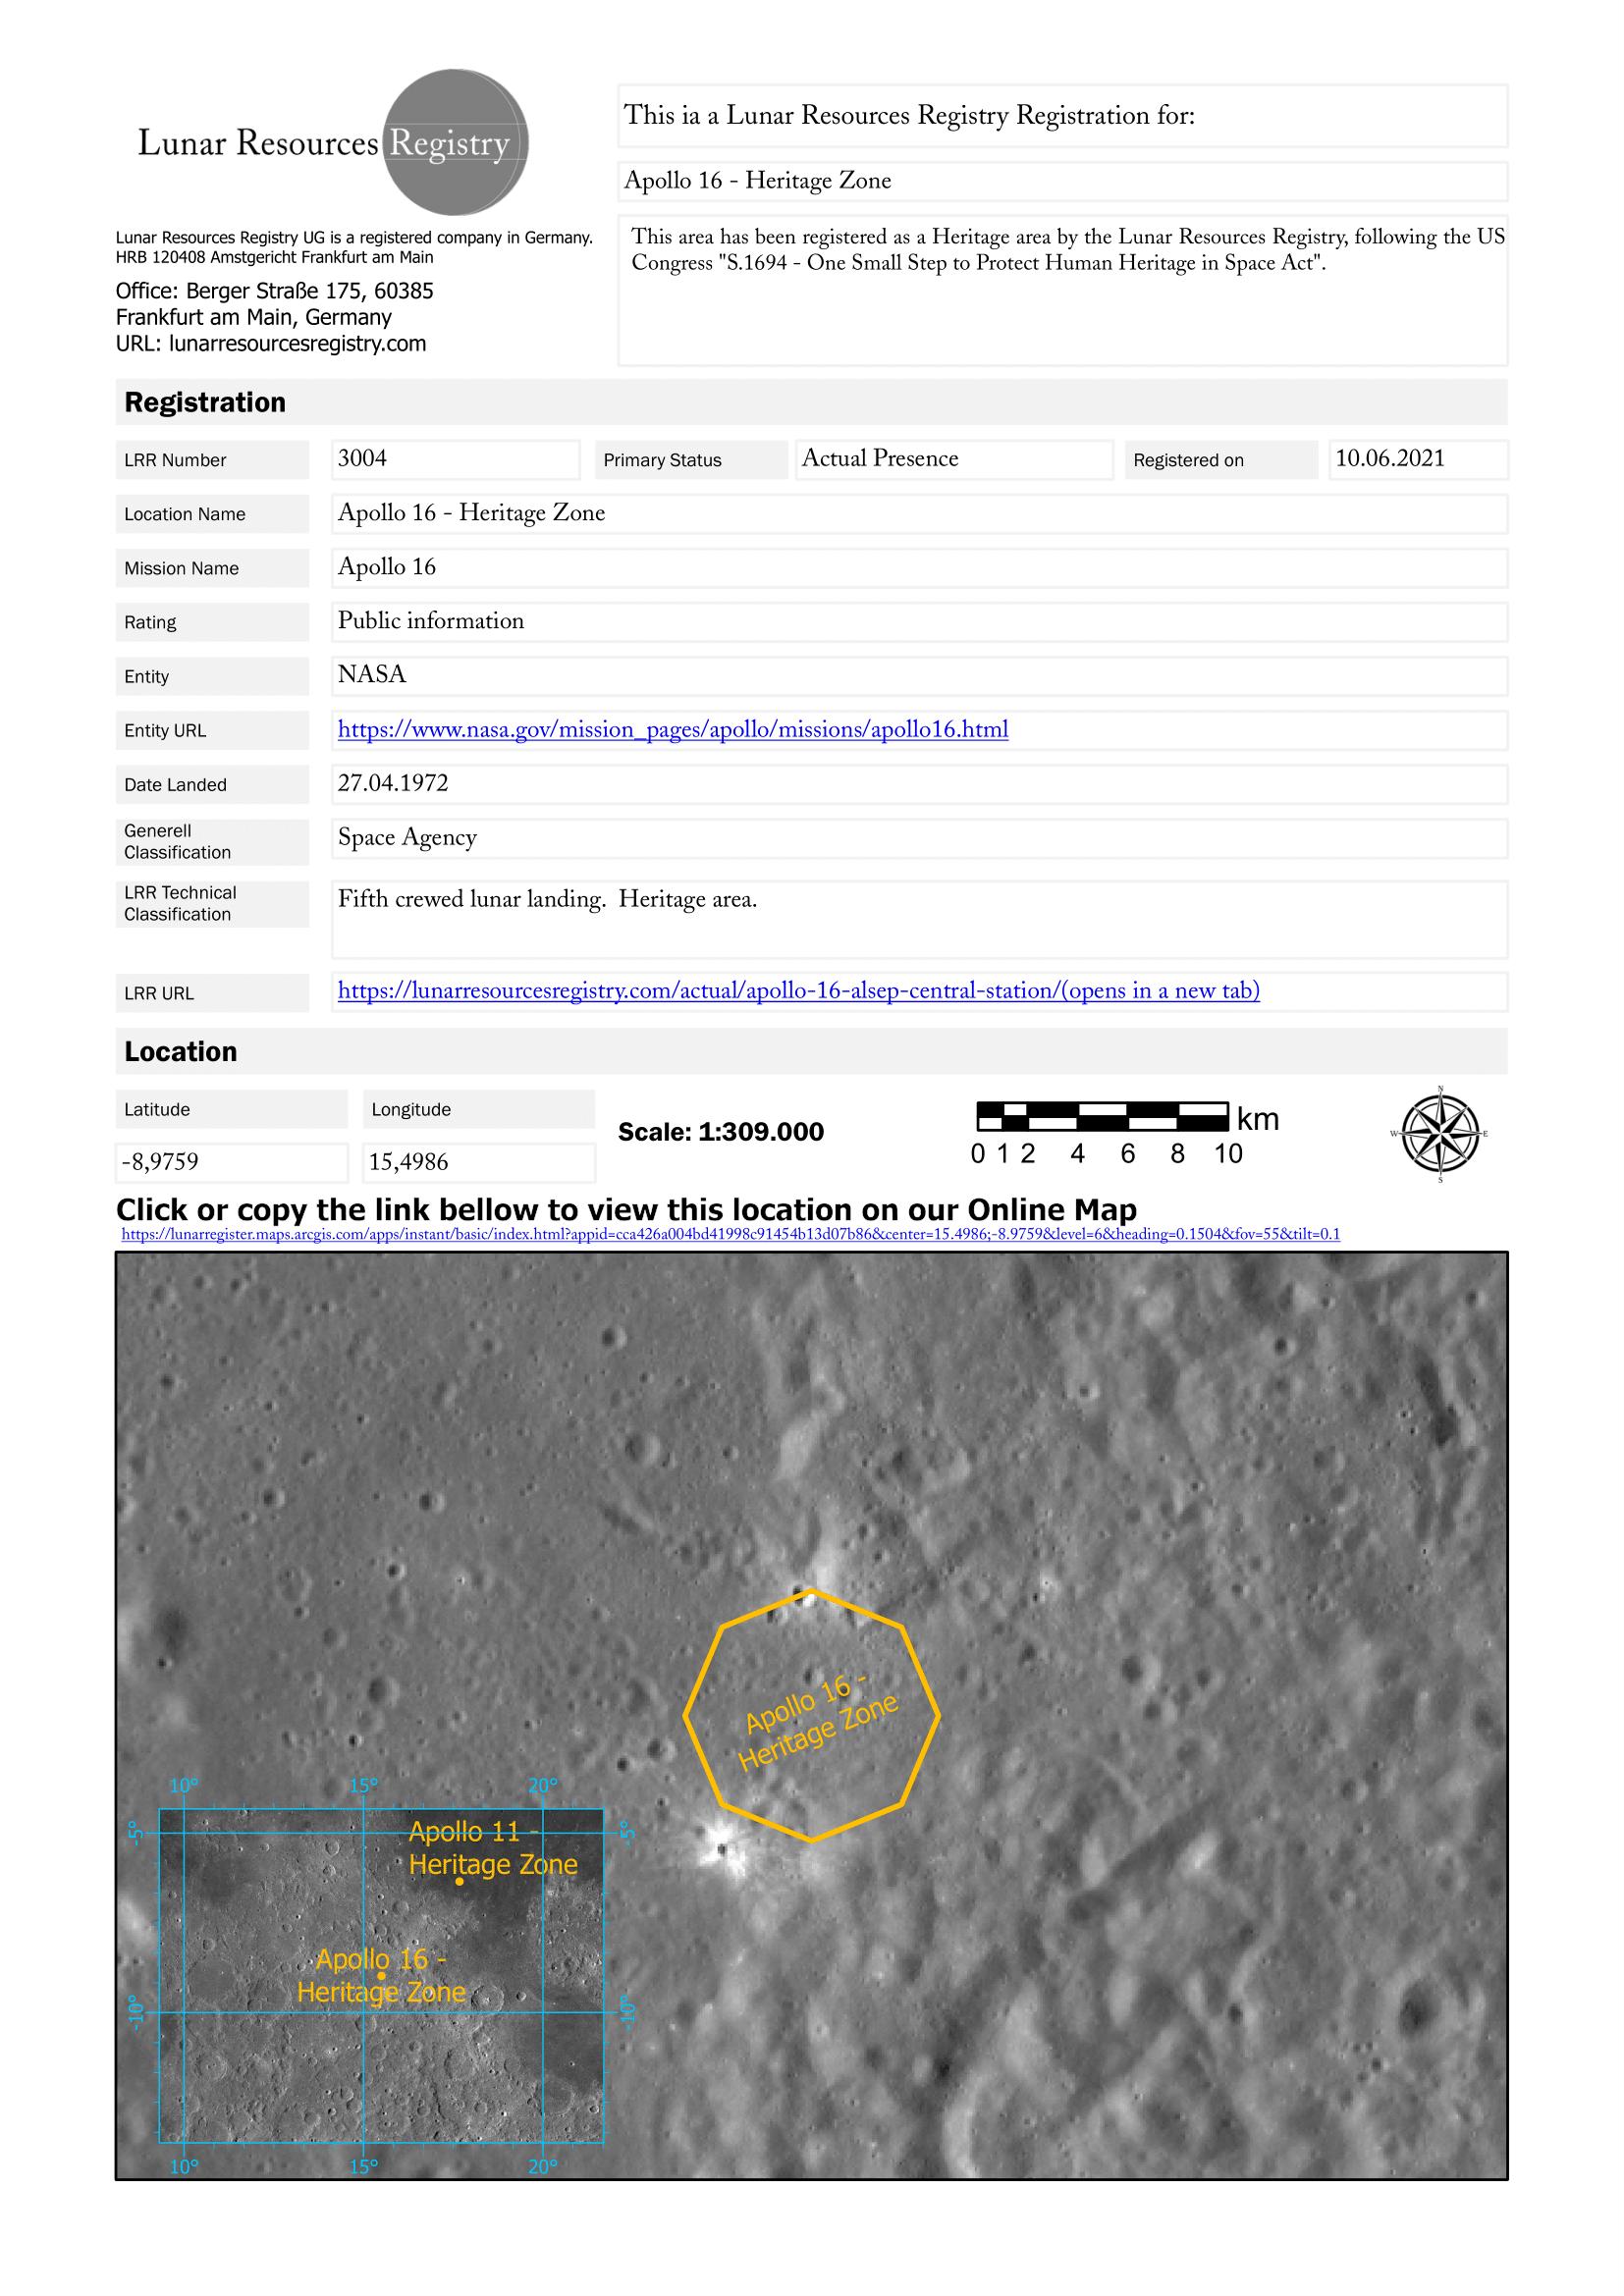 Lunar Resources Registration, Lunar Zoning Heritage Area Apollo 16